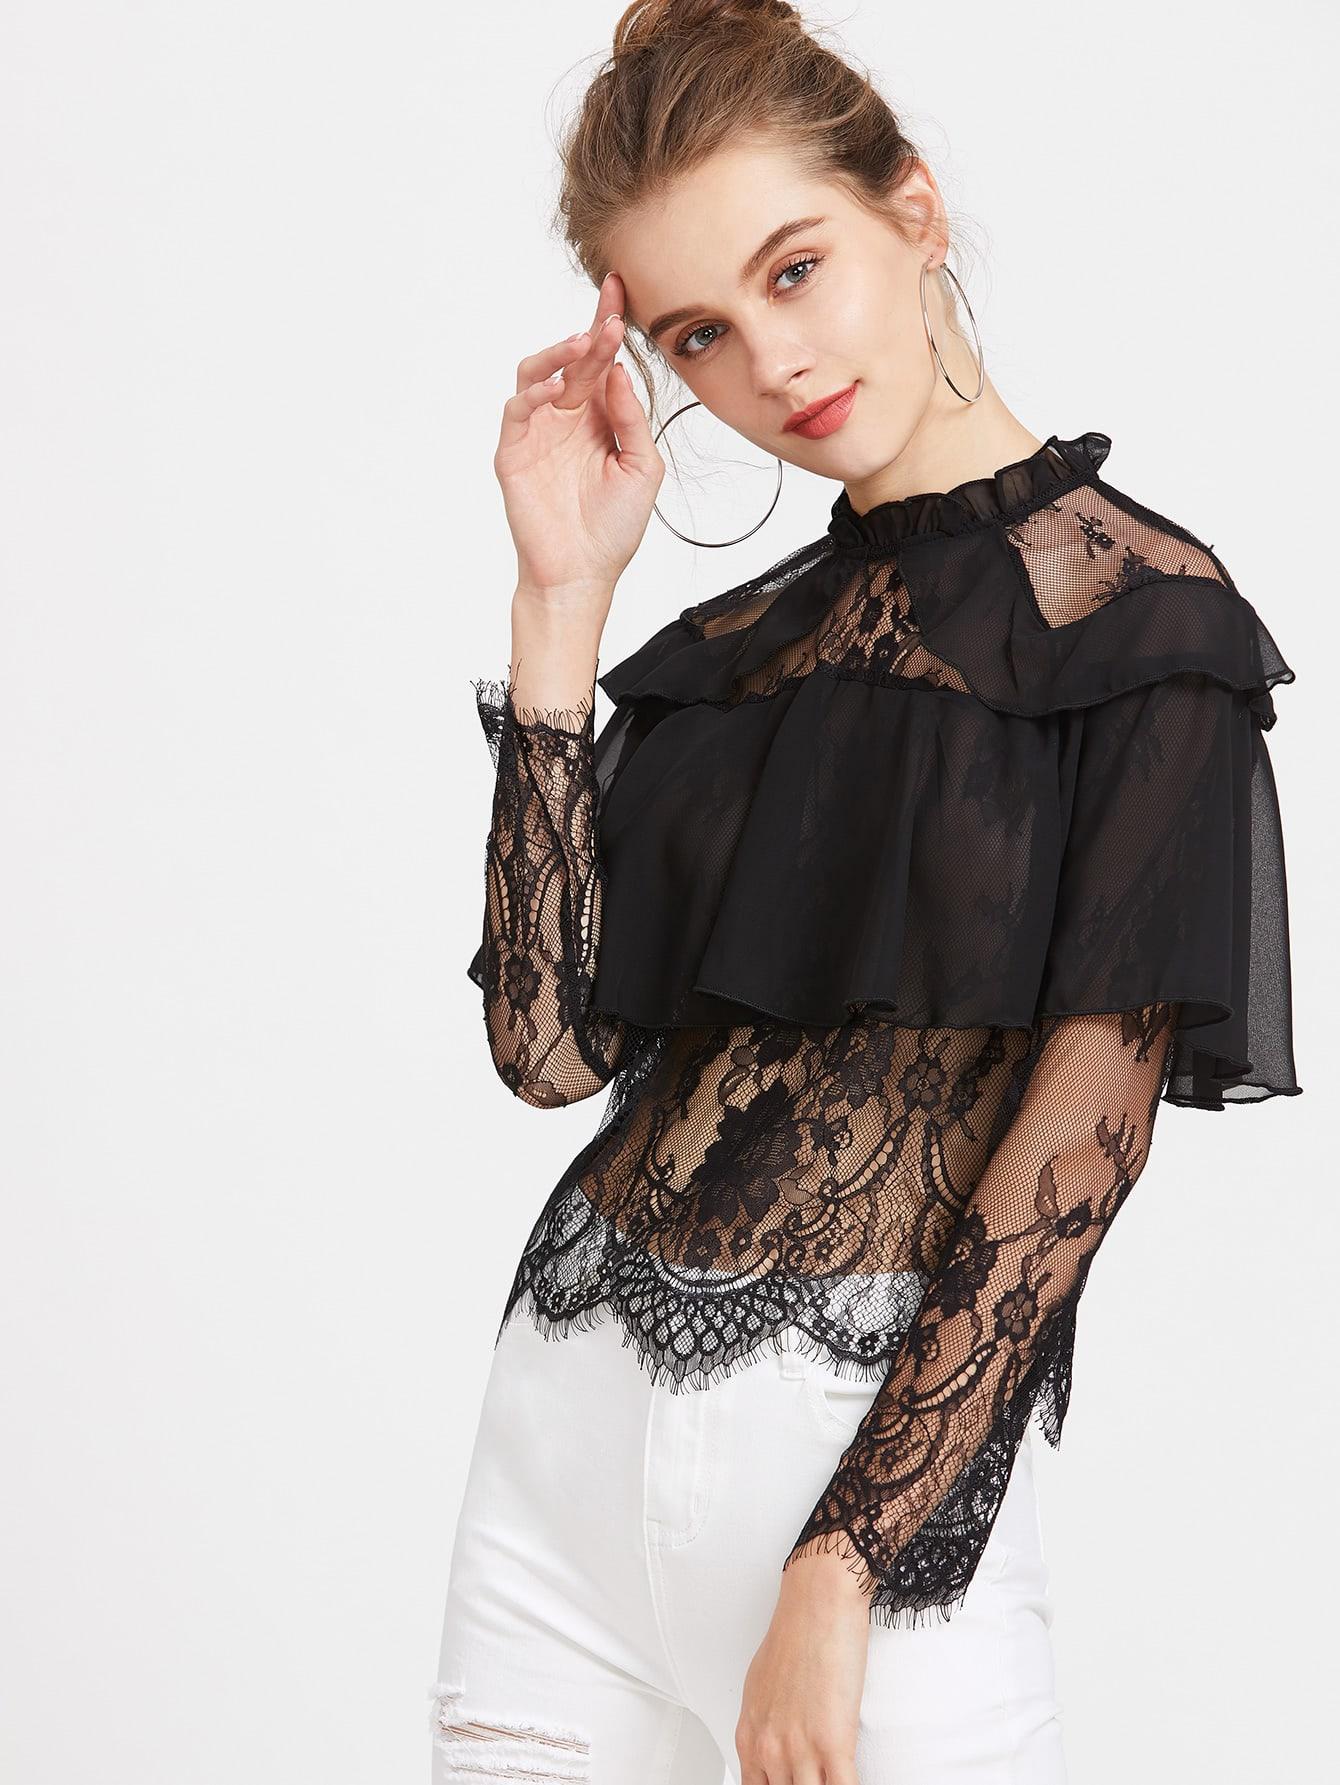 Contrast Lace Ruffle Trim Sheer Blouse blouse170310403